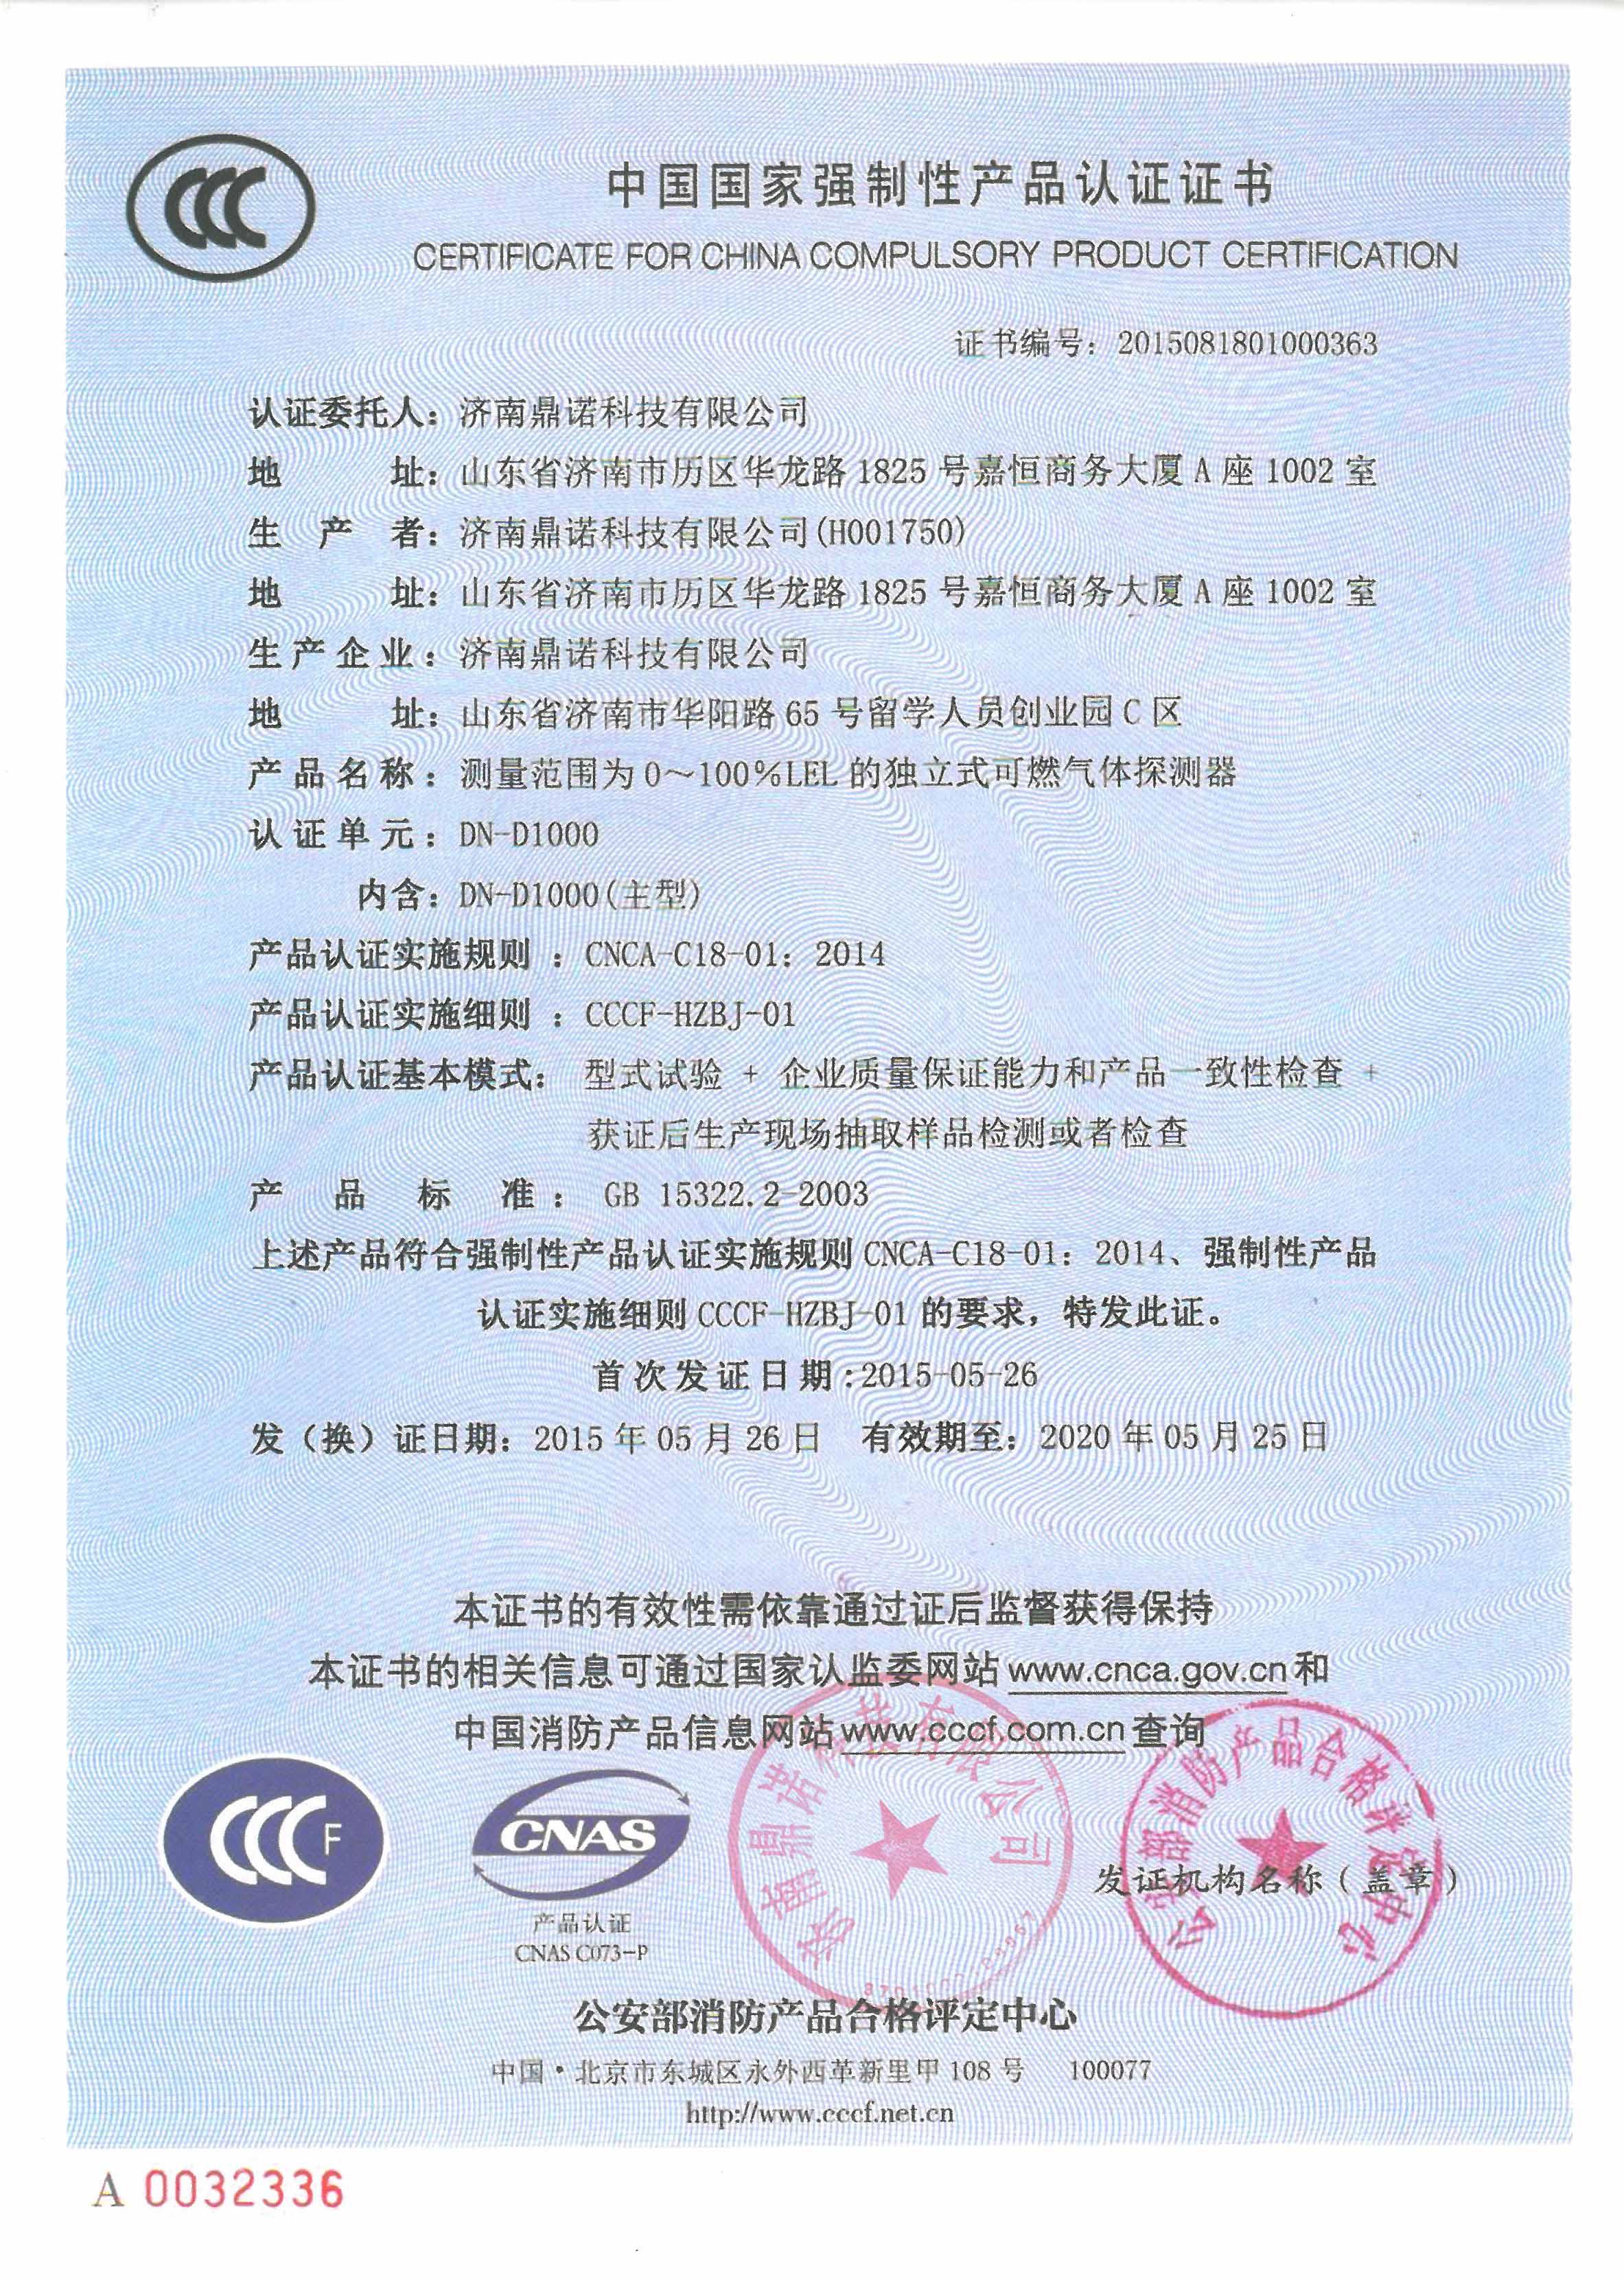 DN-D1000型式强制产品认证证书